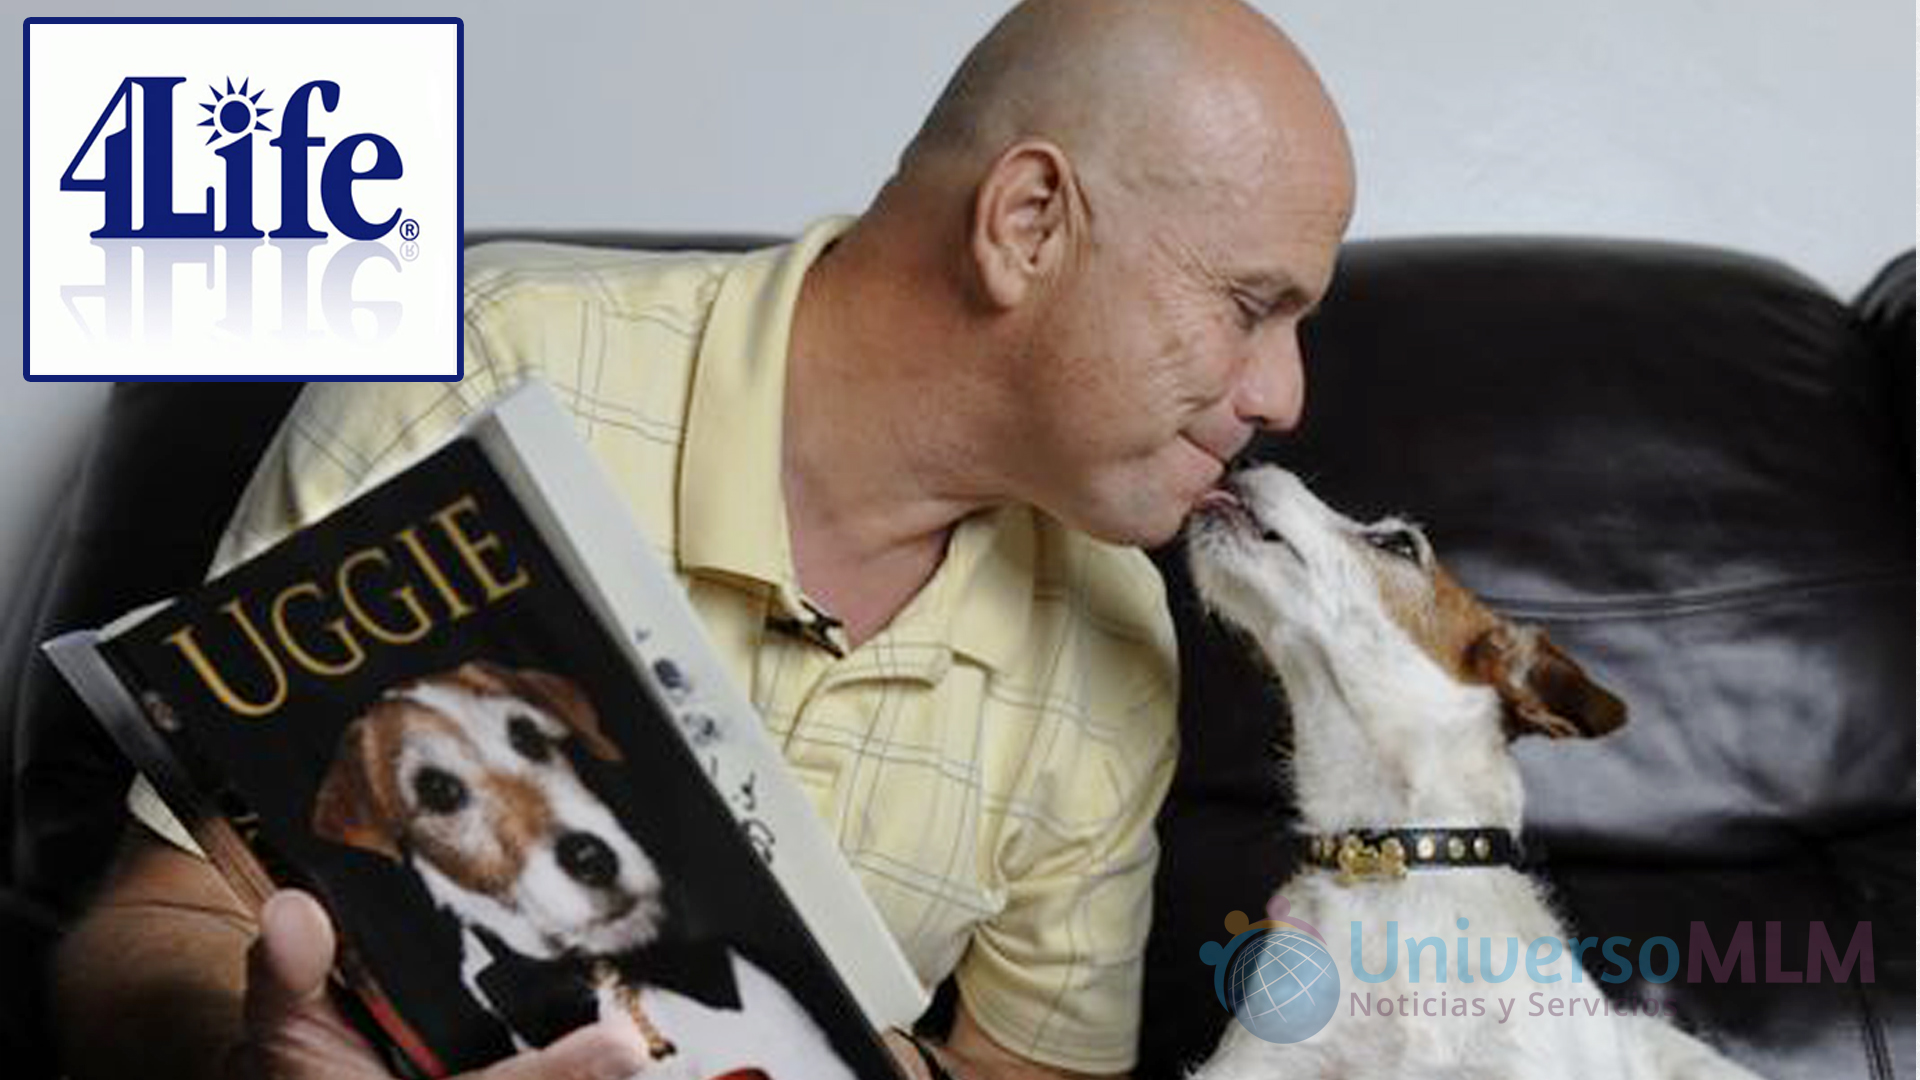 Uggie, el famoso perro del cine, consume 4Life